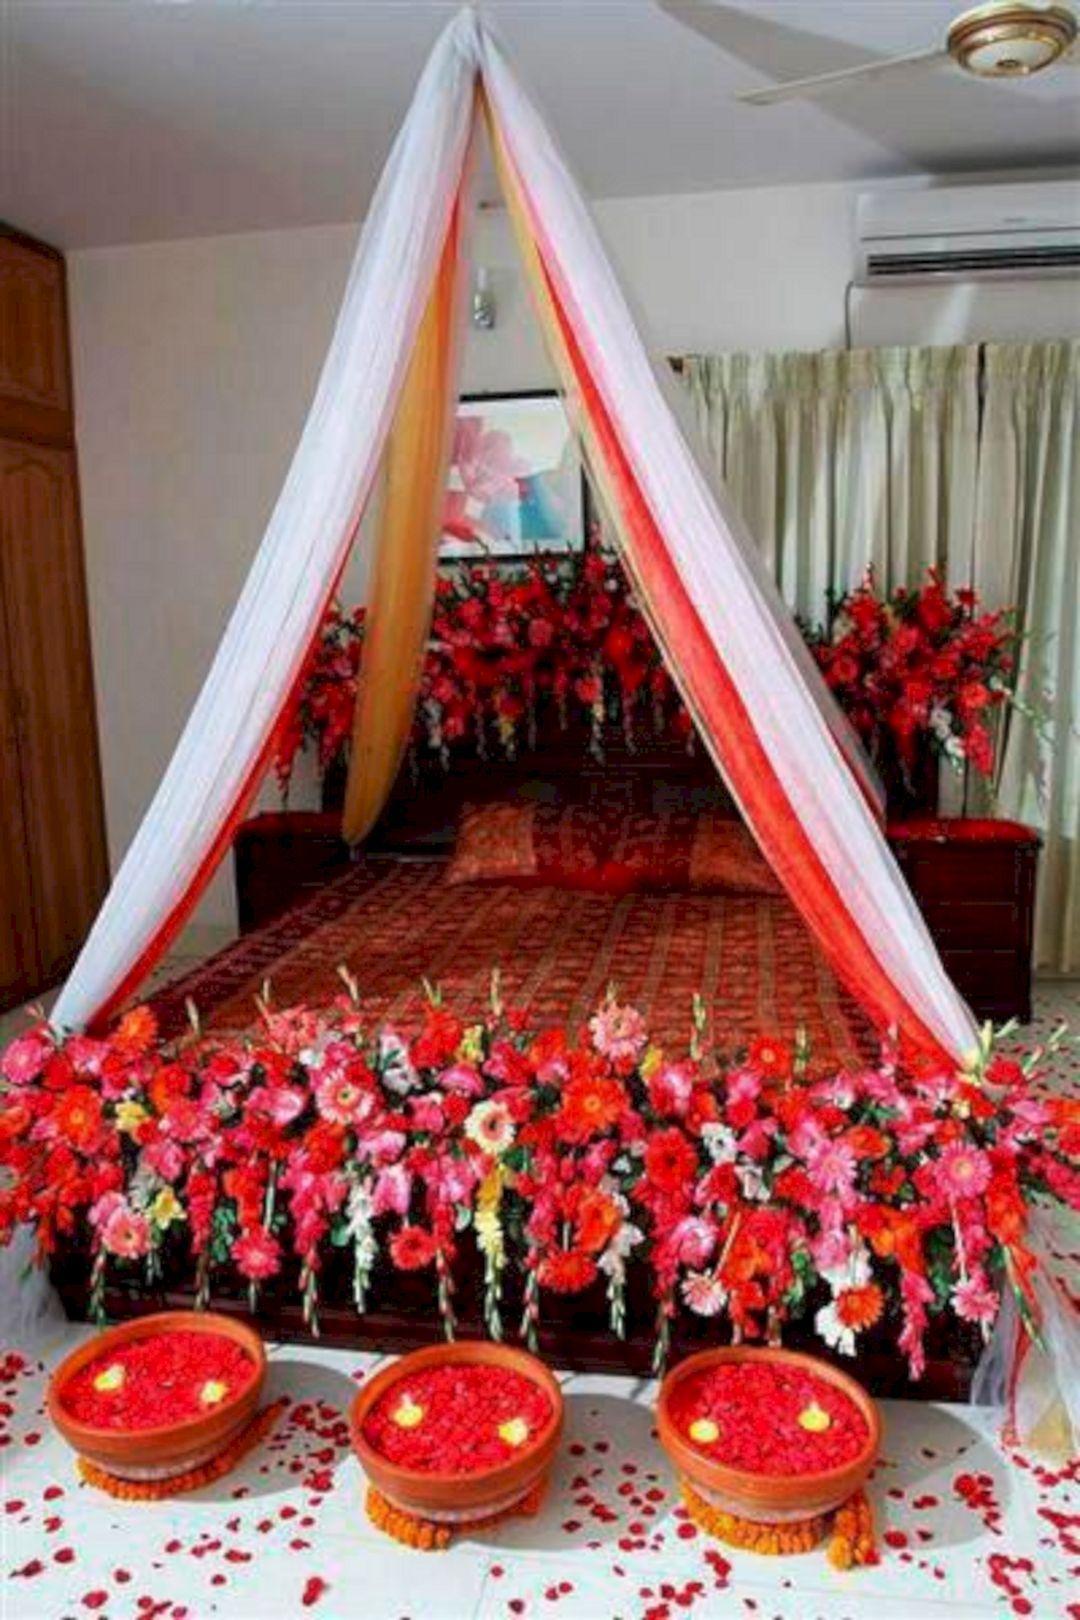 Wedding room decoration ideas   Awesome Wedding Night Room Decoration Ideas  Wedding night